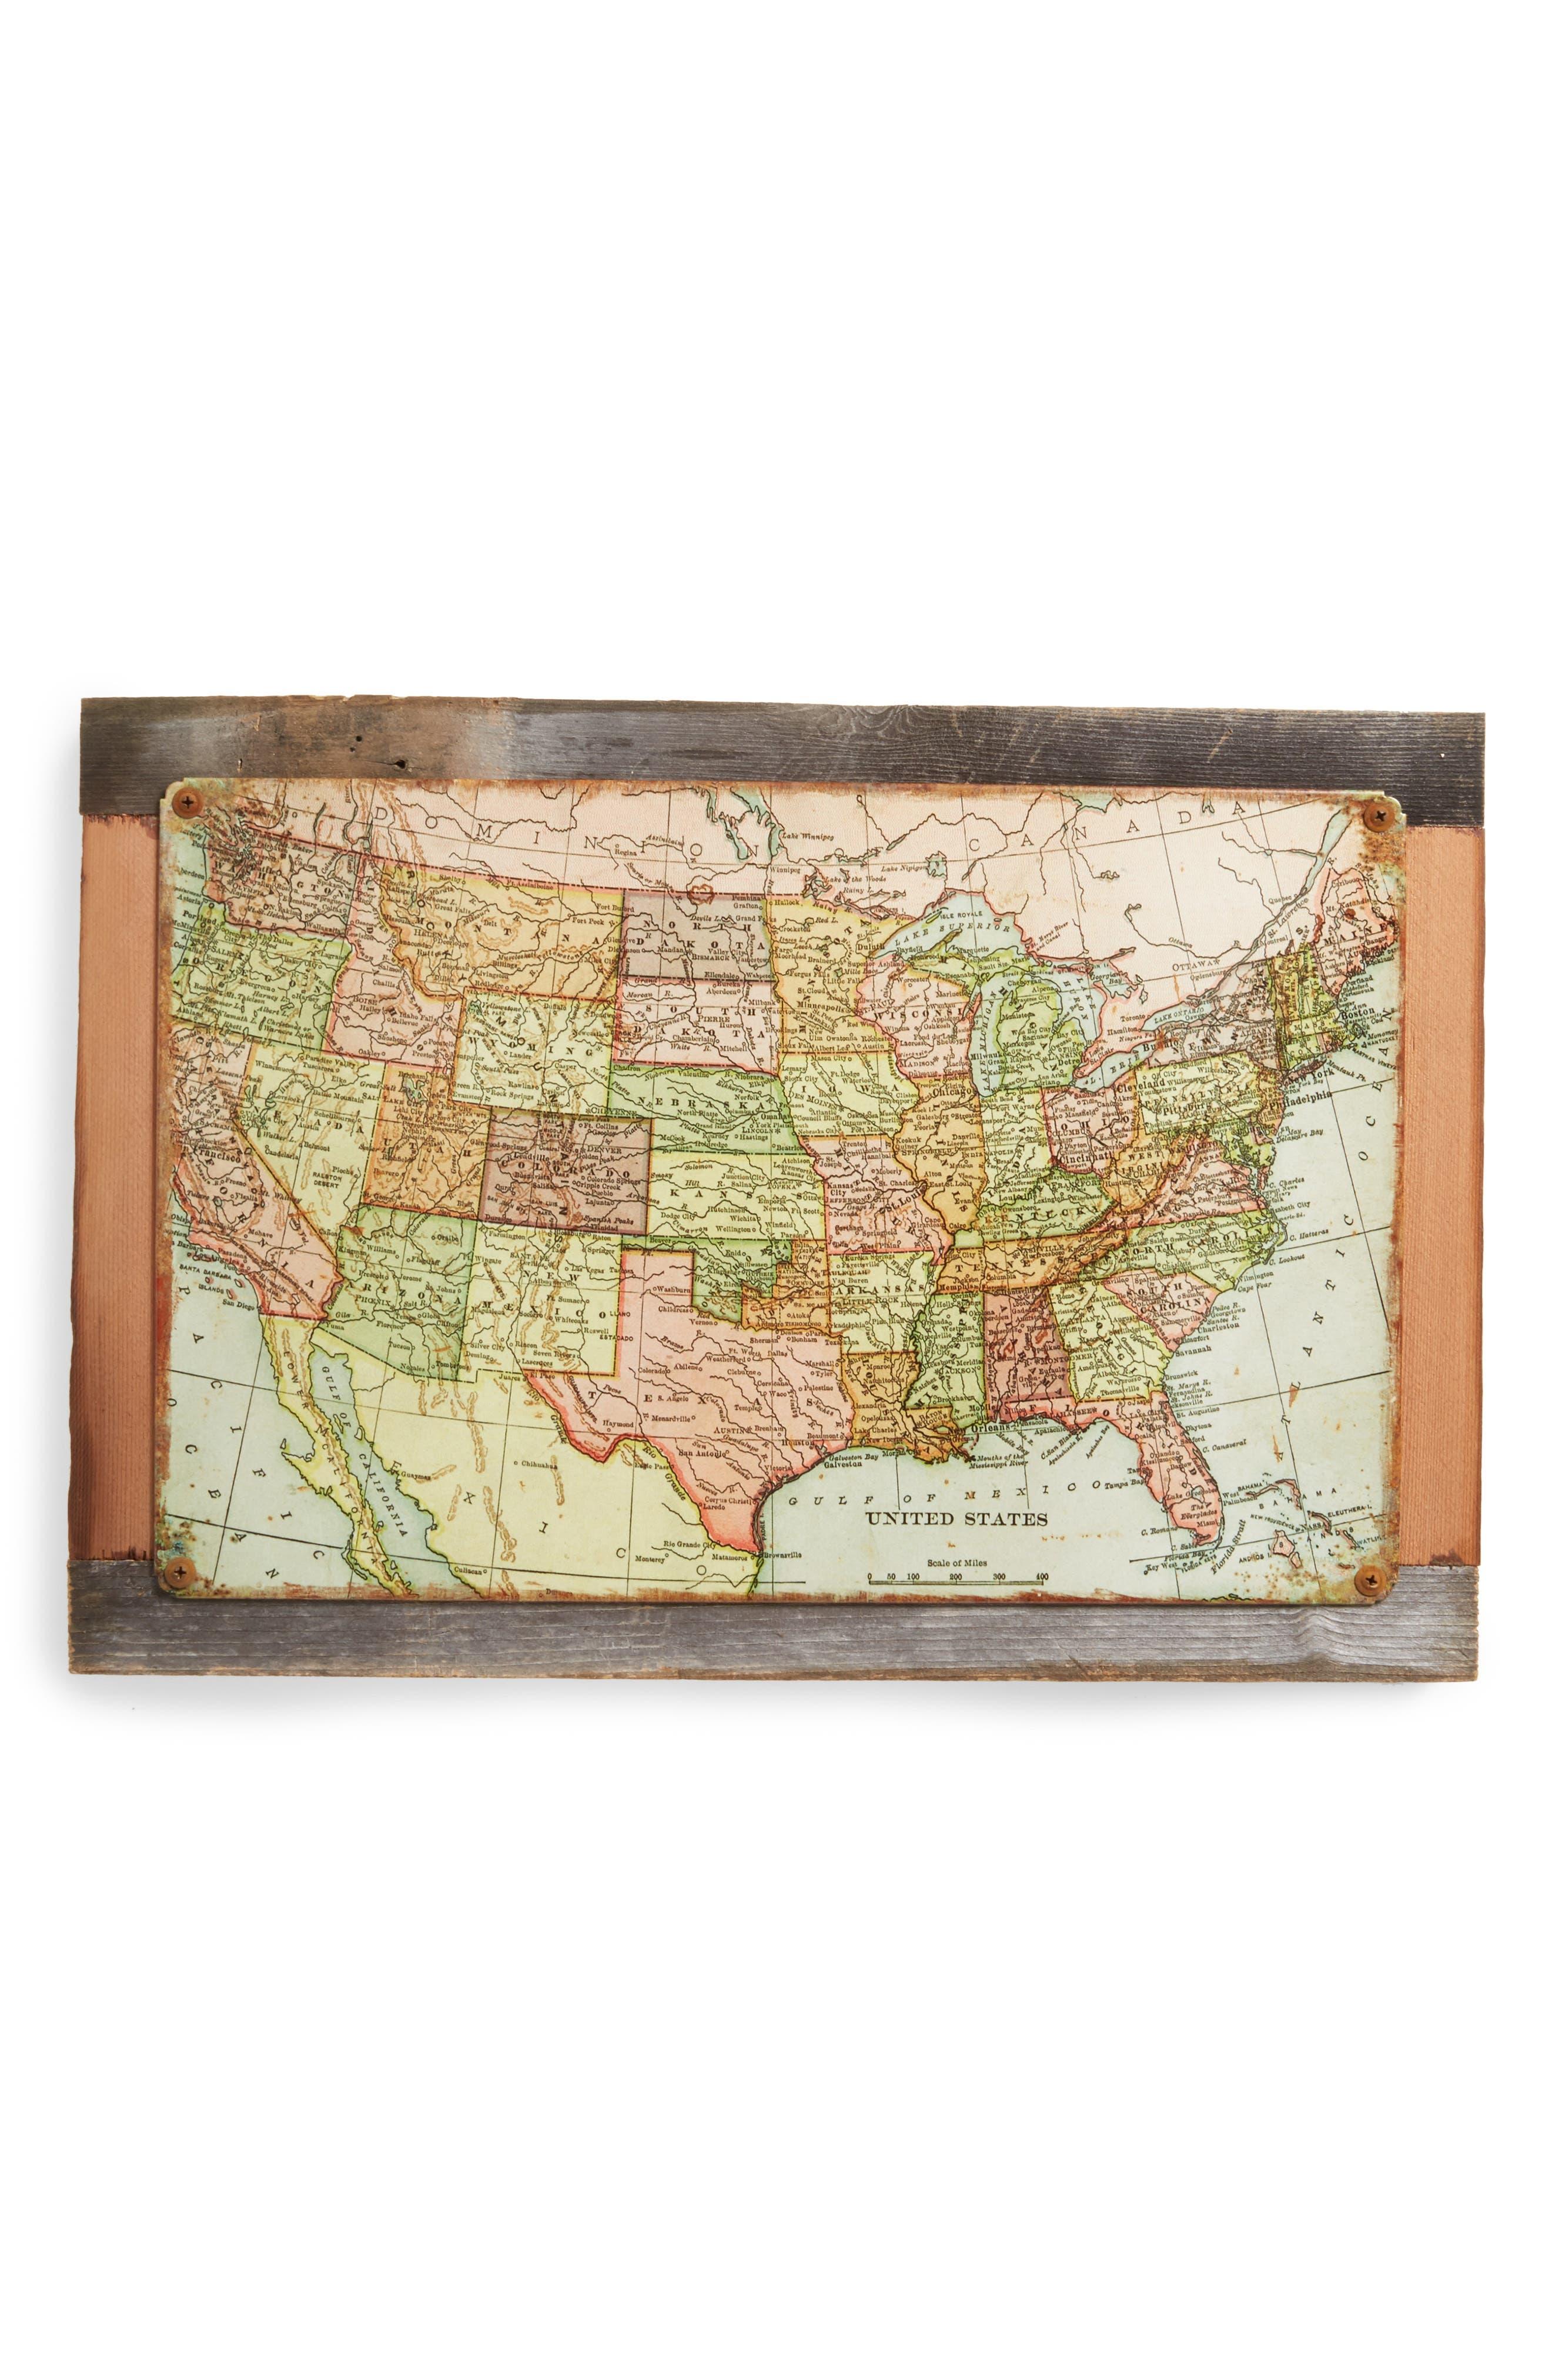 Poncho & Goldstein U.S. Map Wall Art